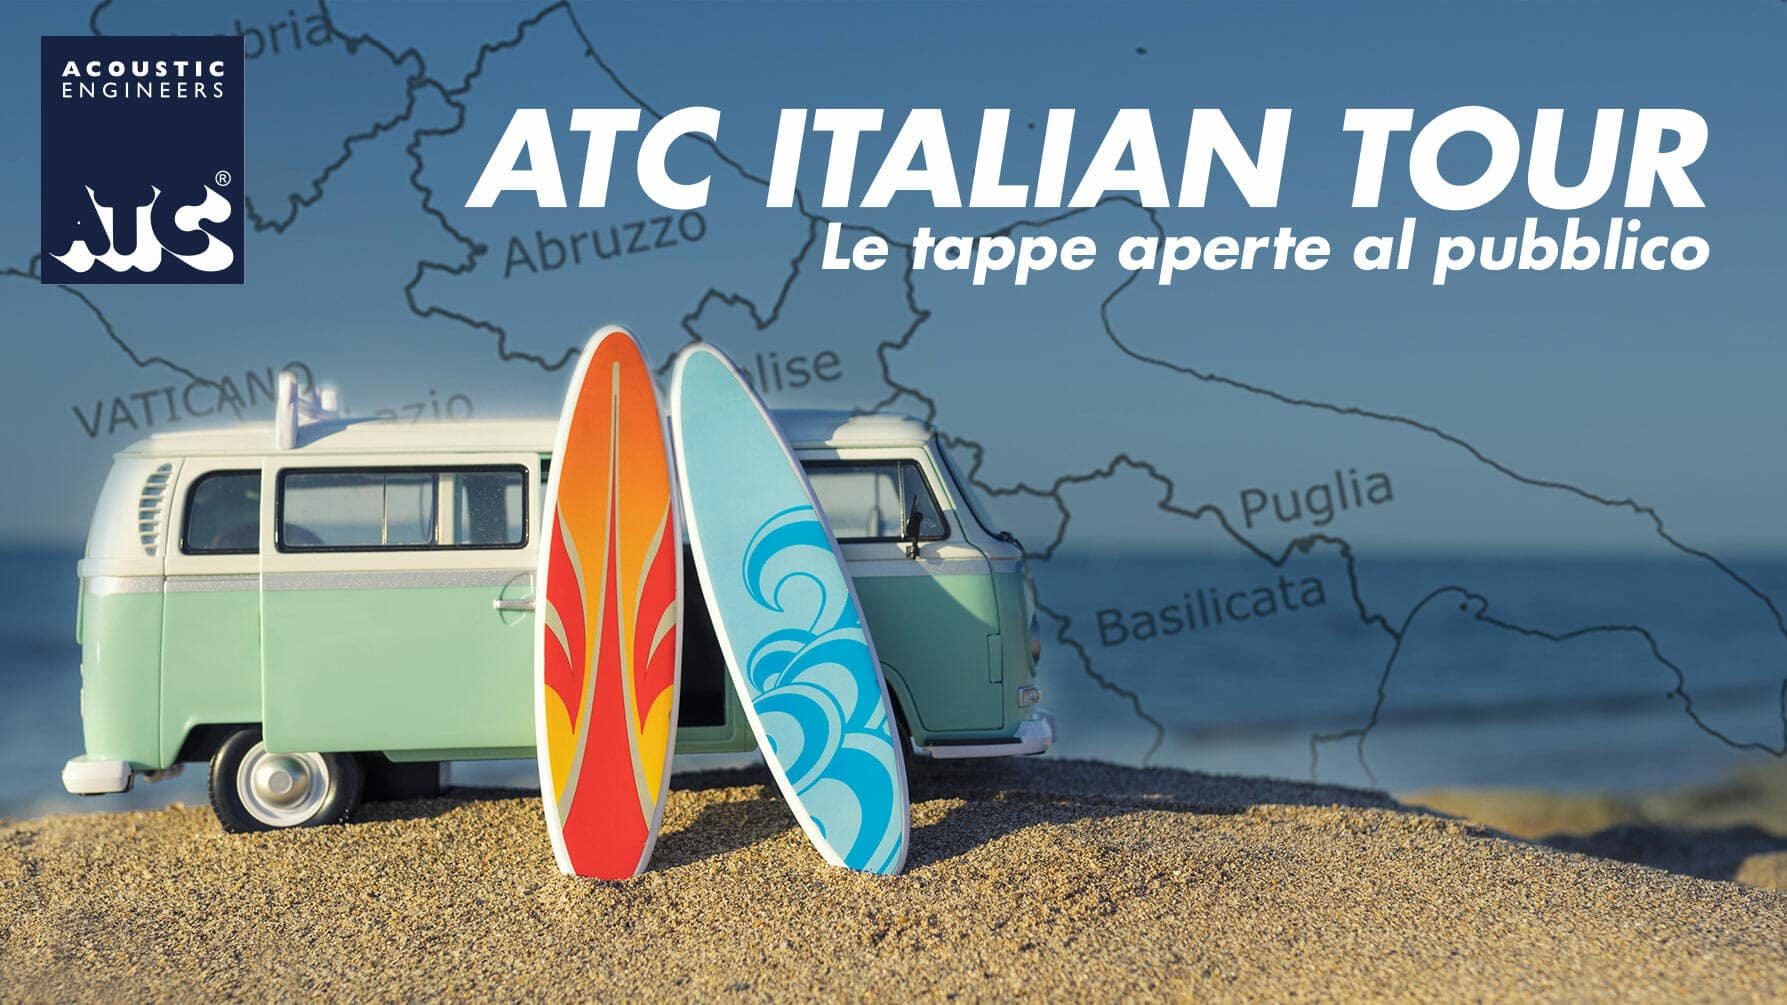 ATC Italian Tour Date Luglio